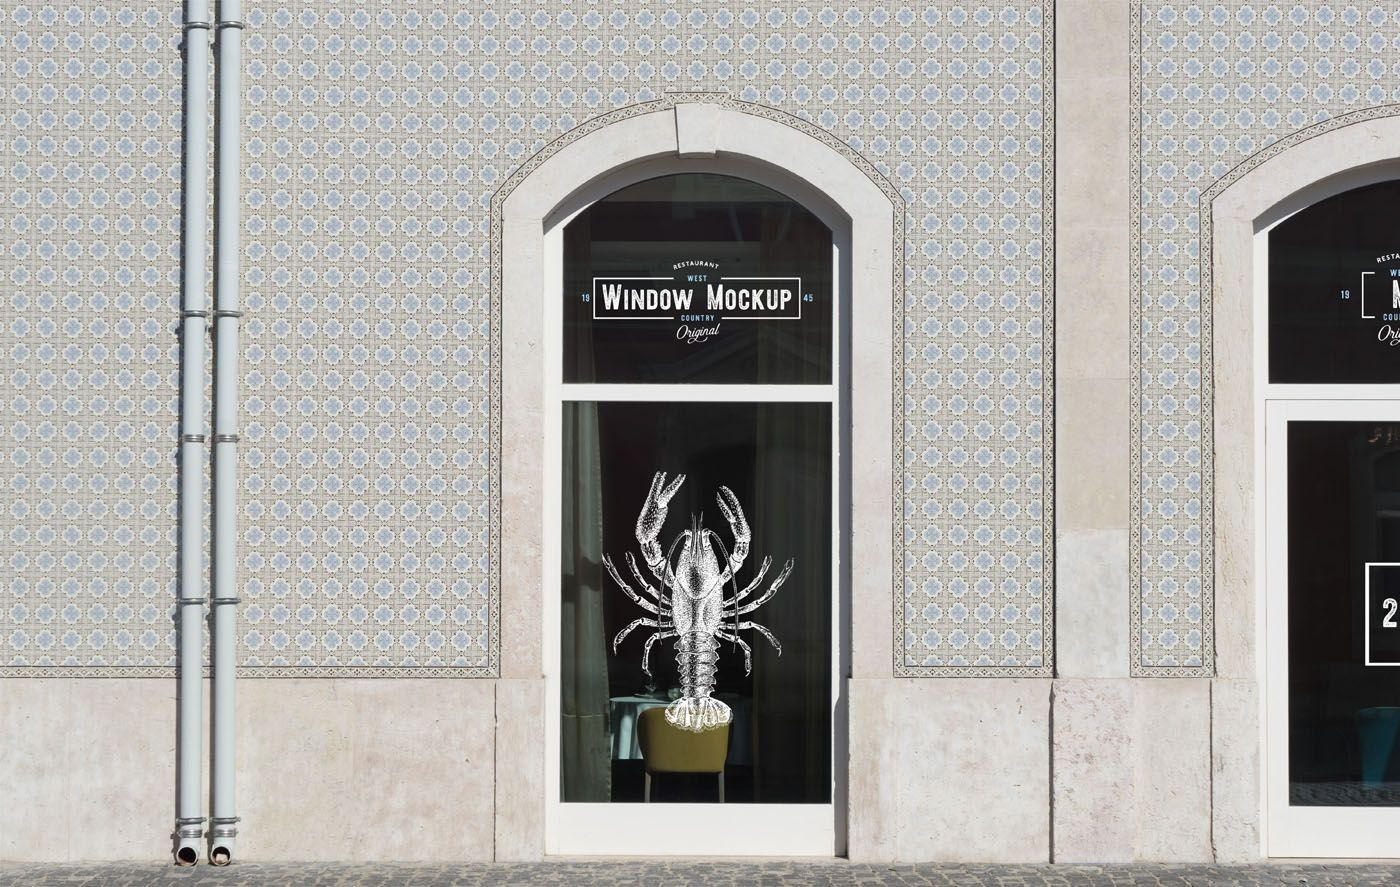 Free Shop Window Mockup In 2020 Mockup Free Mockup Shop Window